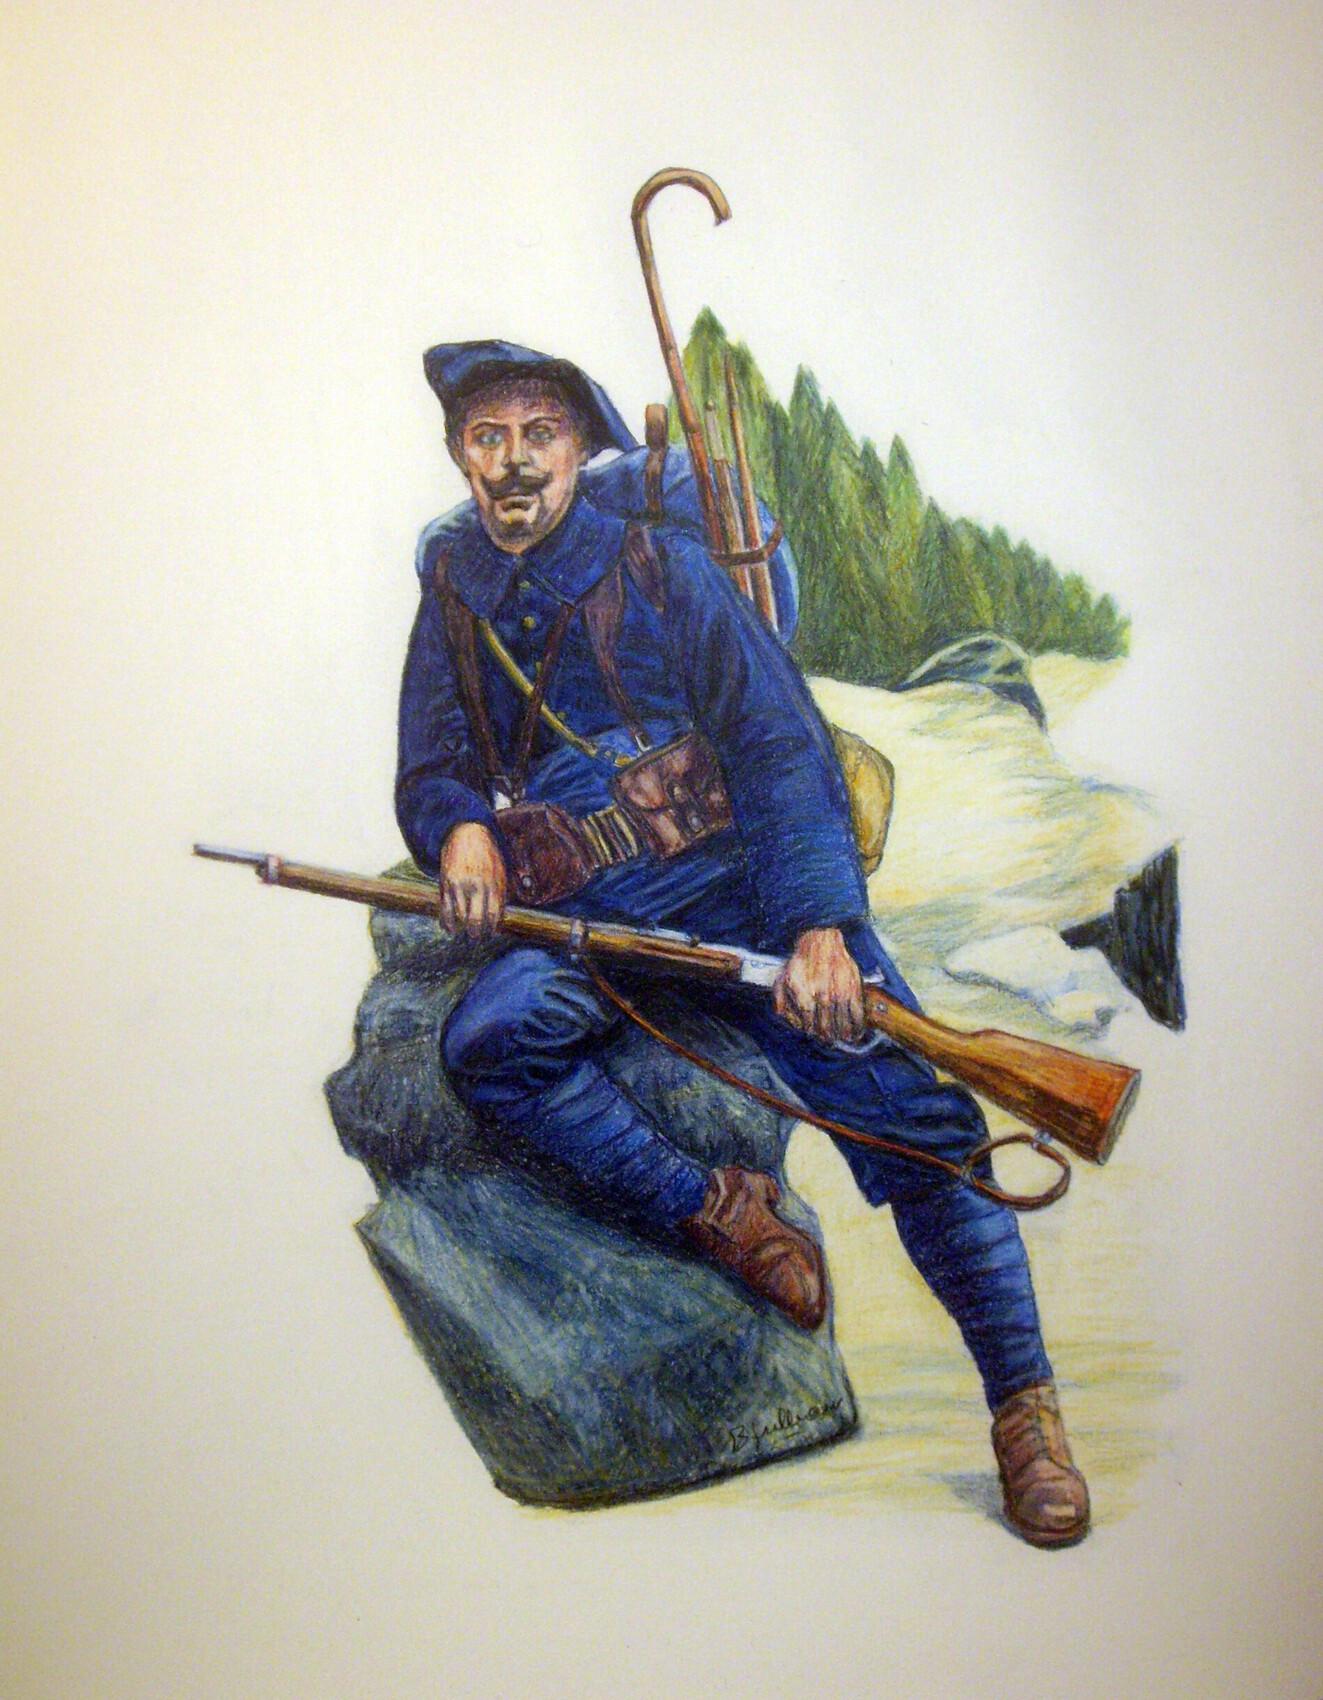 chasseur alpin au repos